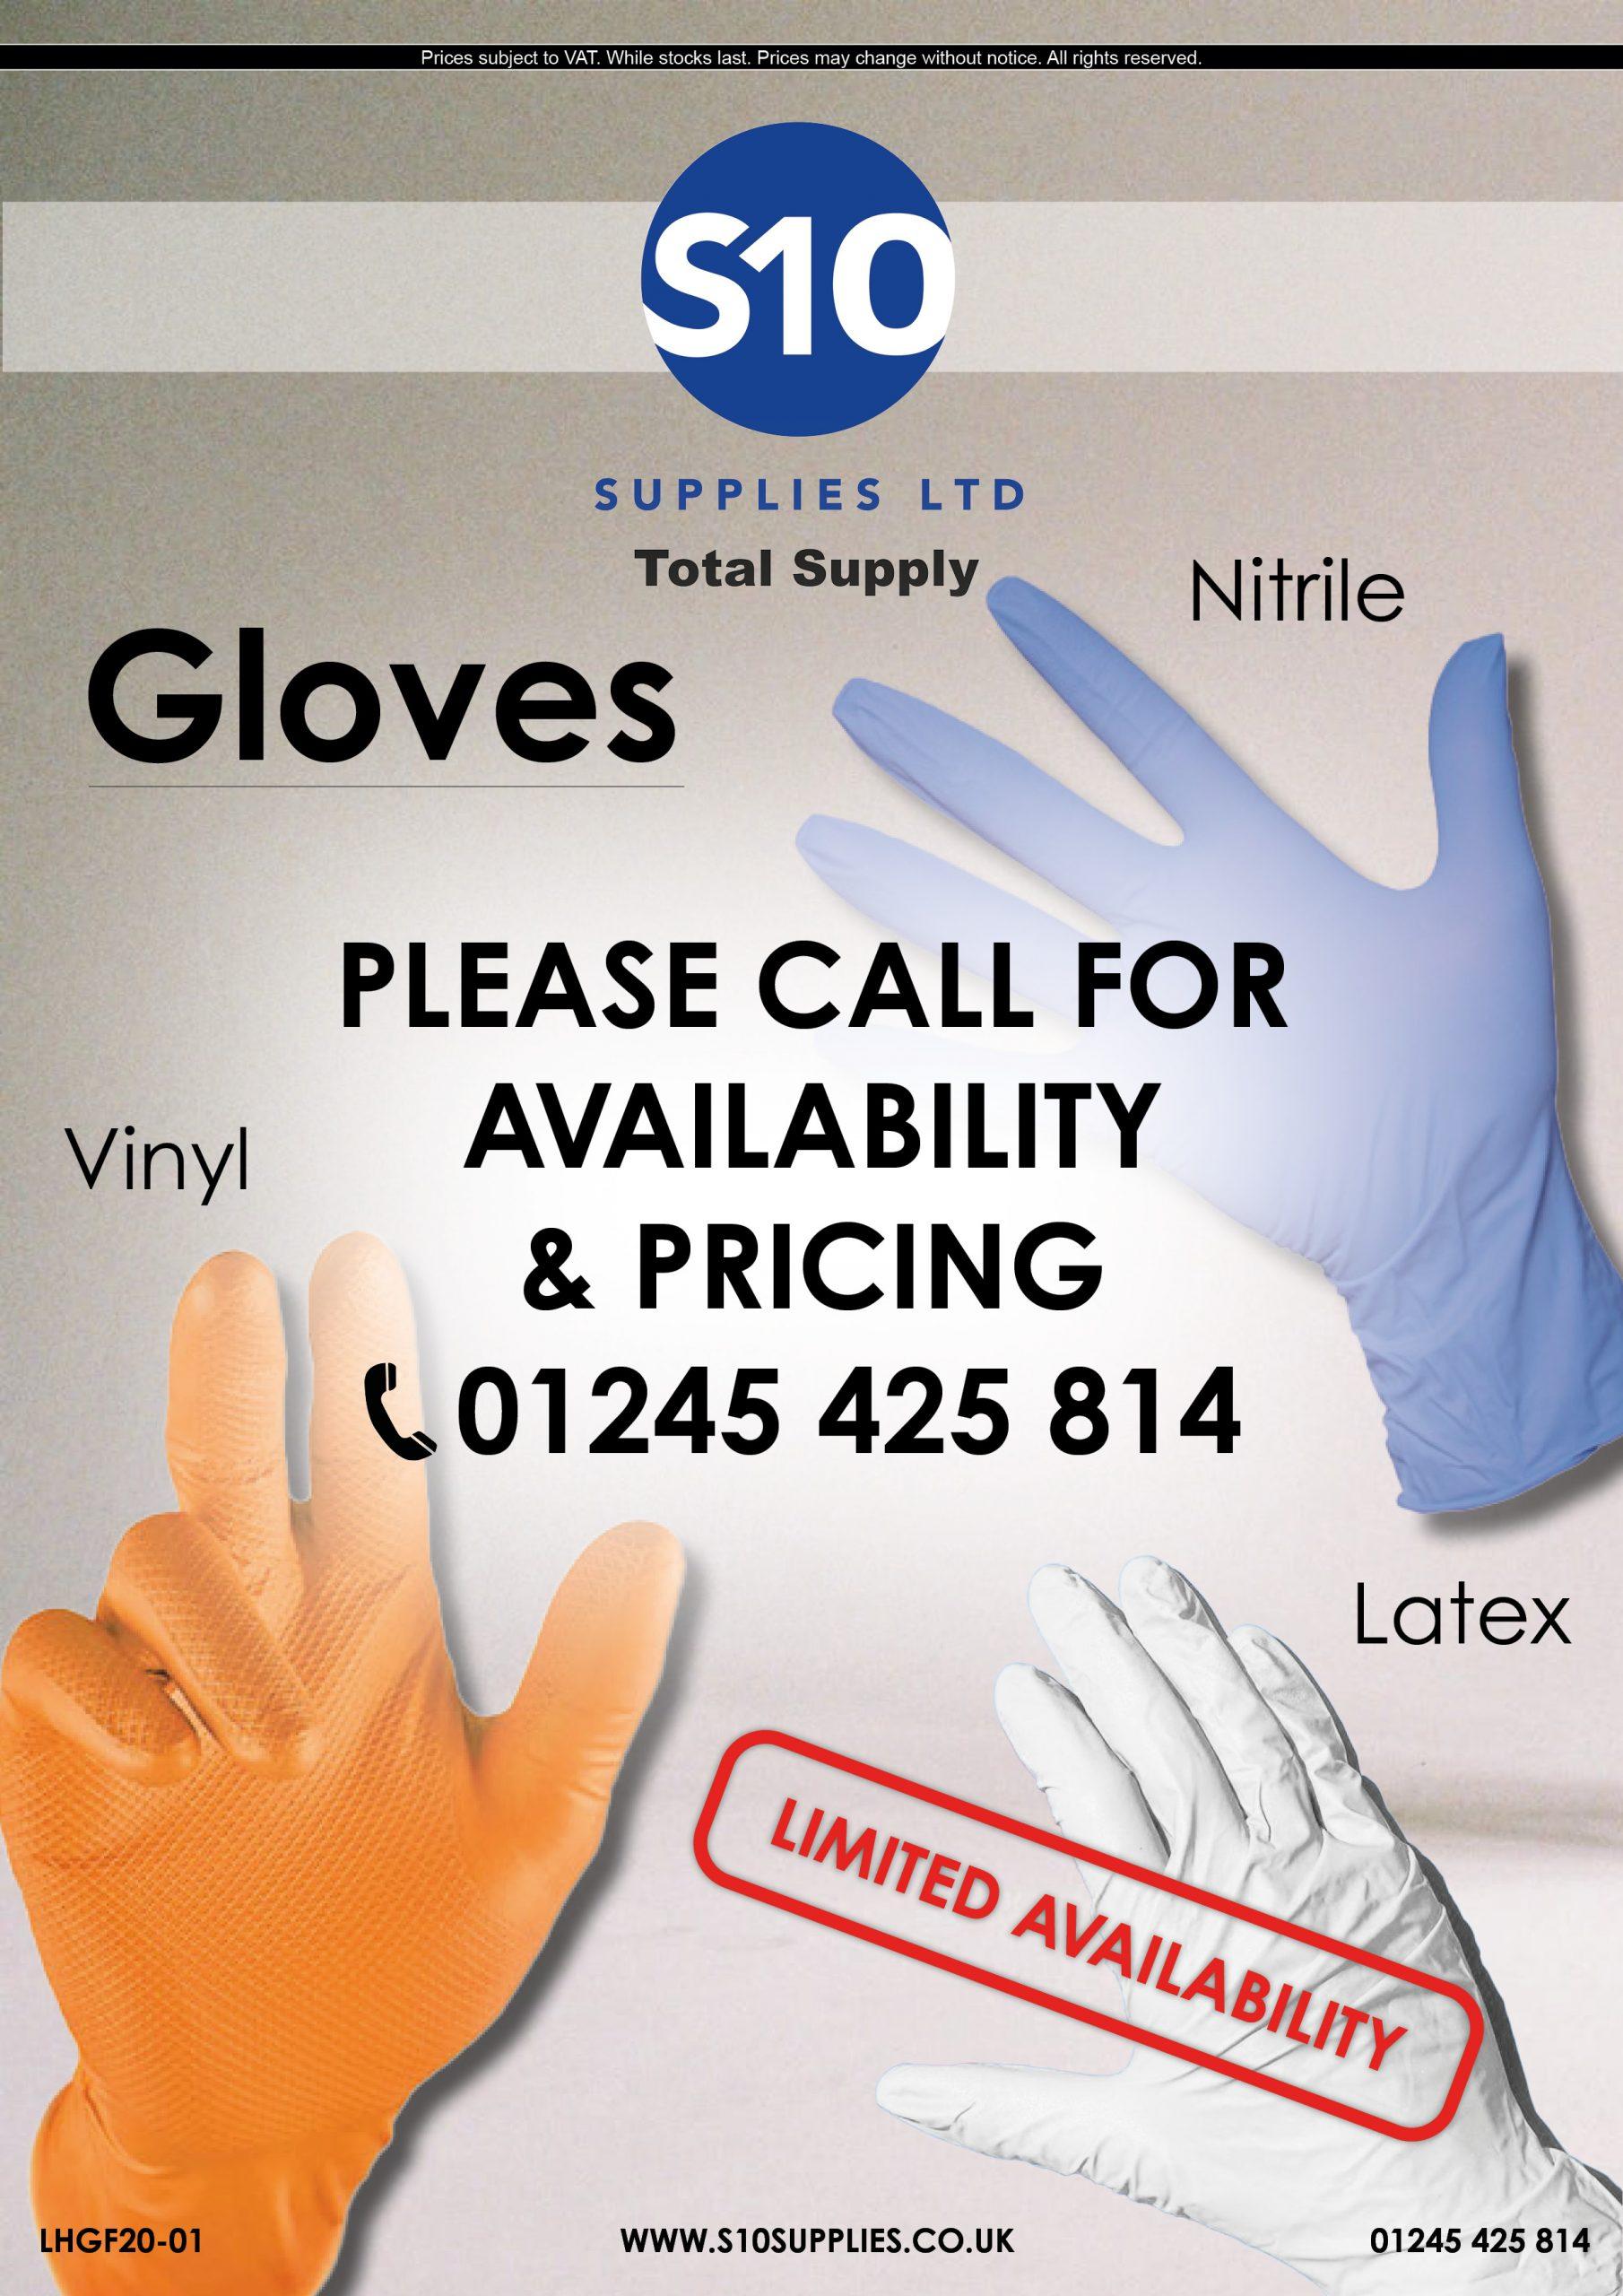 Flyer - Gloves